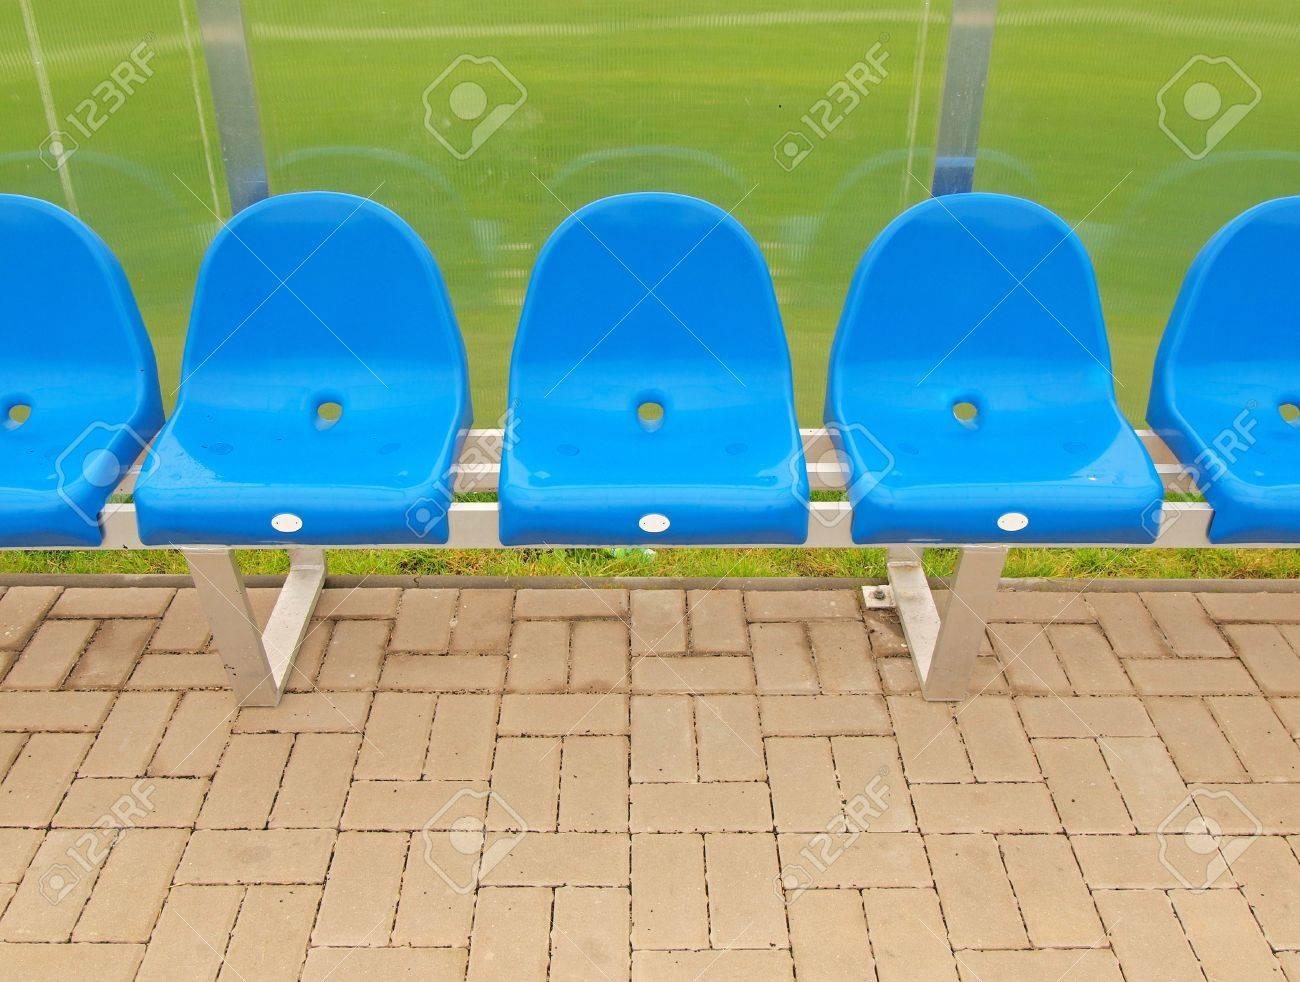 Neue Blaue Plastiksitze Outdoor Buhne Fussballspieler Bank Stuhle